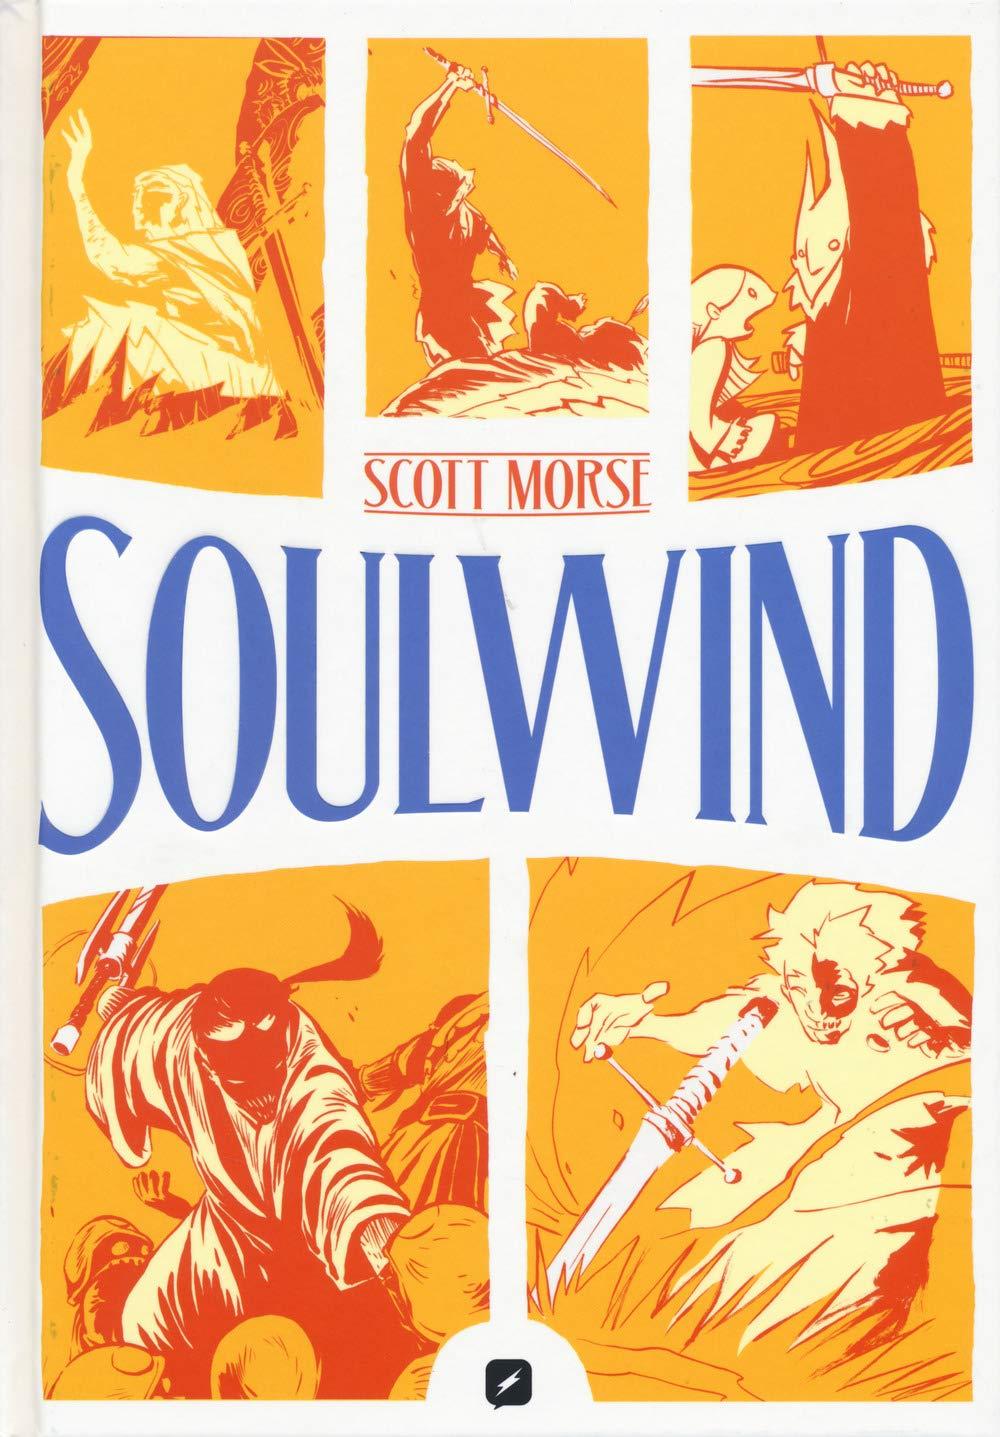 Scott Morse – Soulwind